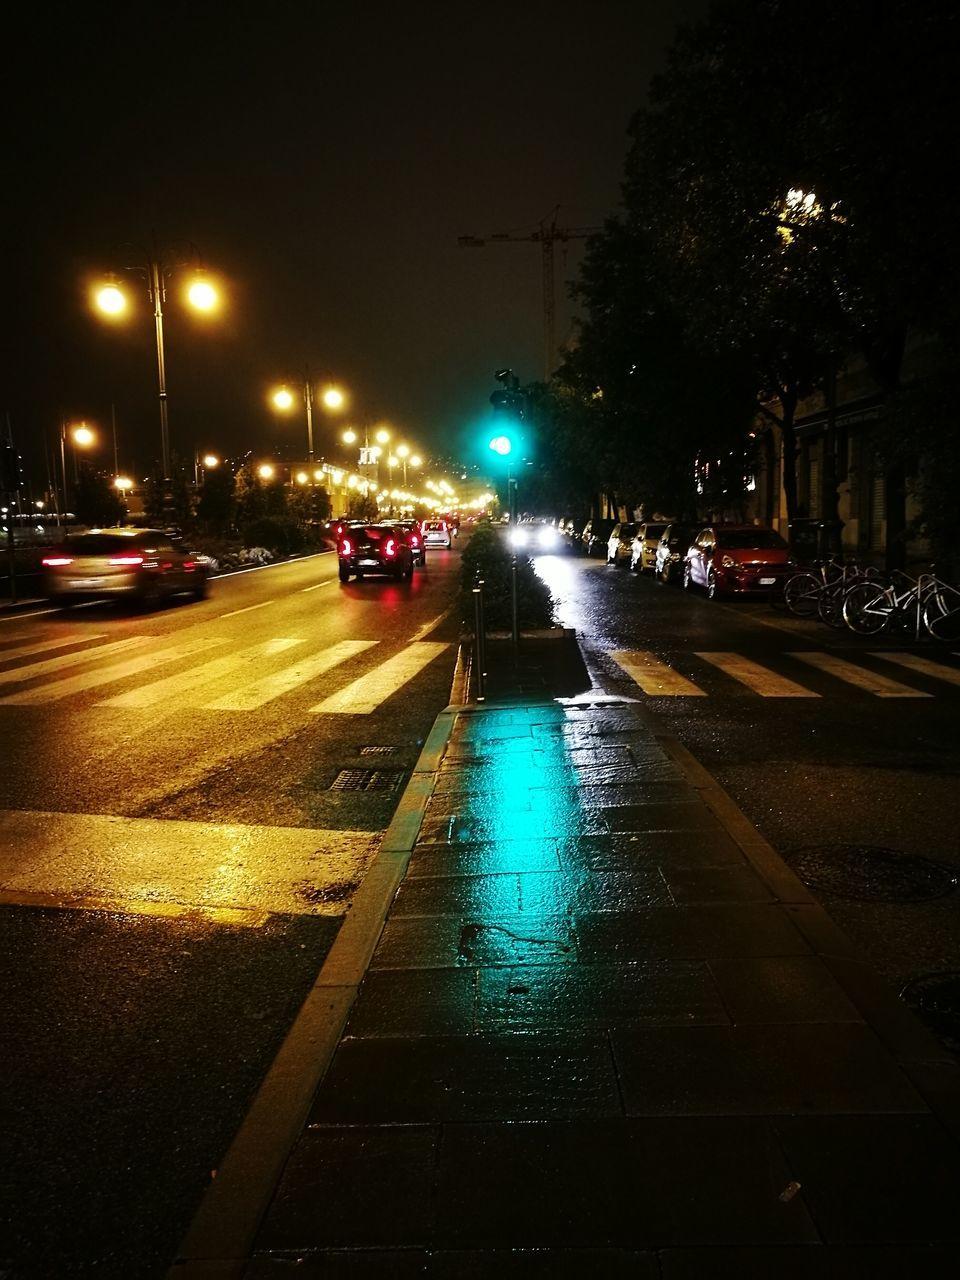 illuminated, night, transportation, street, car, city, road, street light, land vehicle, wet, outdoors, architecture, building exterior, no people, sky